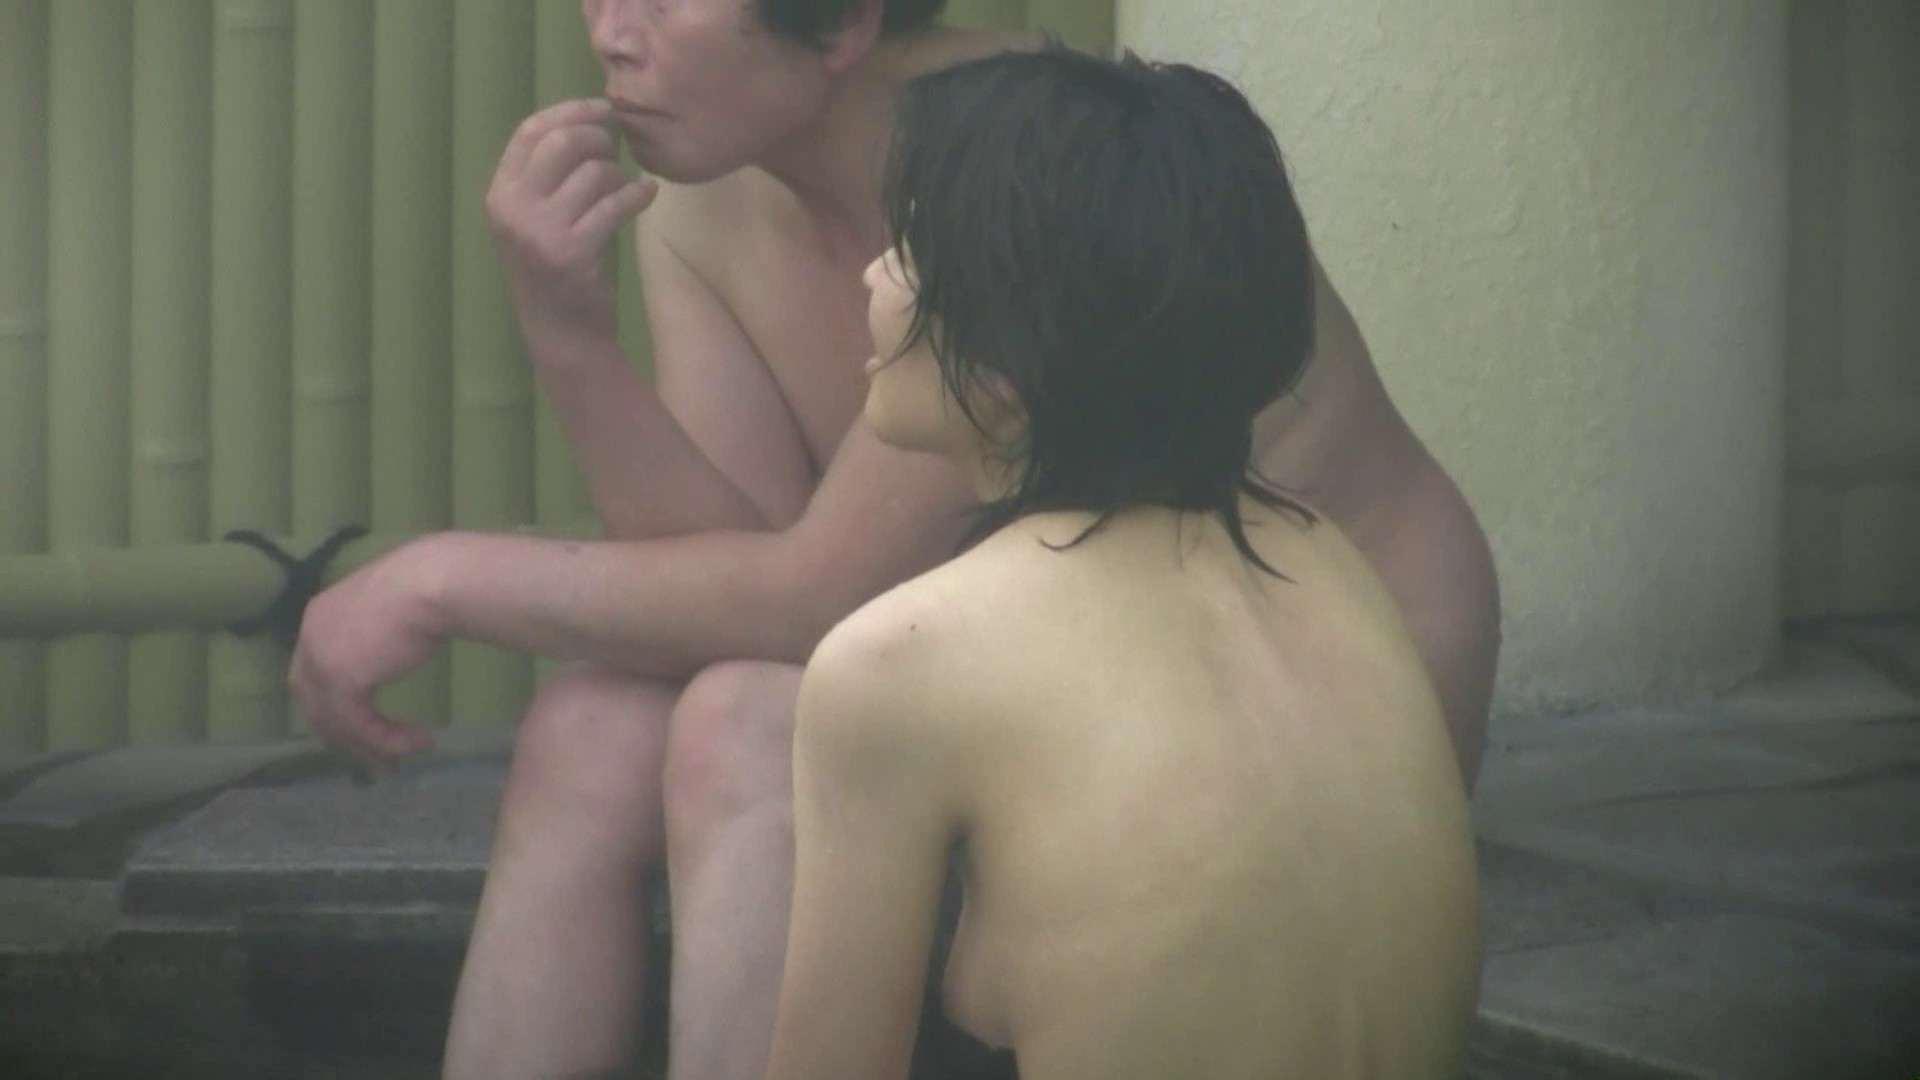 Aquaな露天風呂Vol.583 露天風呂突入 | 盗撮師作品  103pic 37